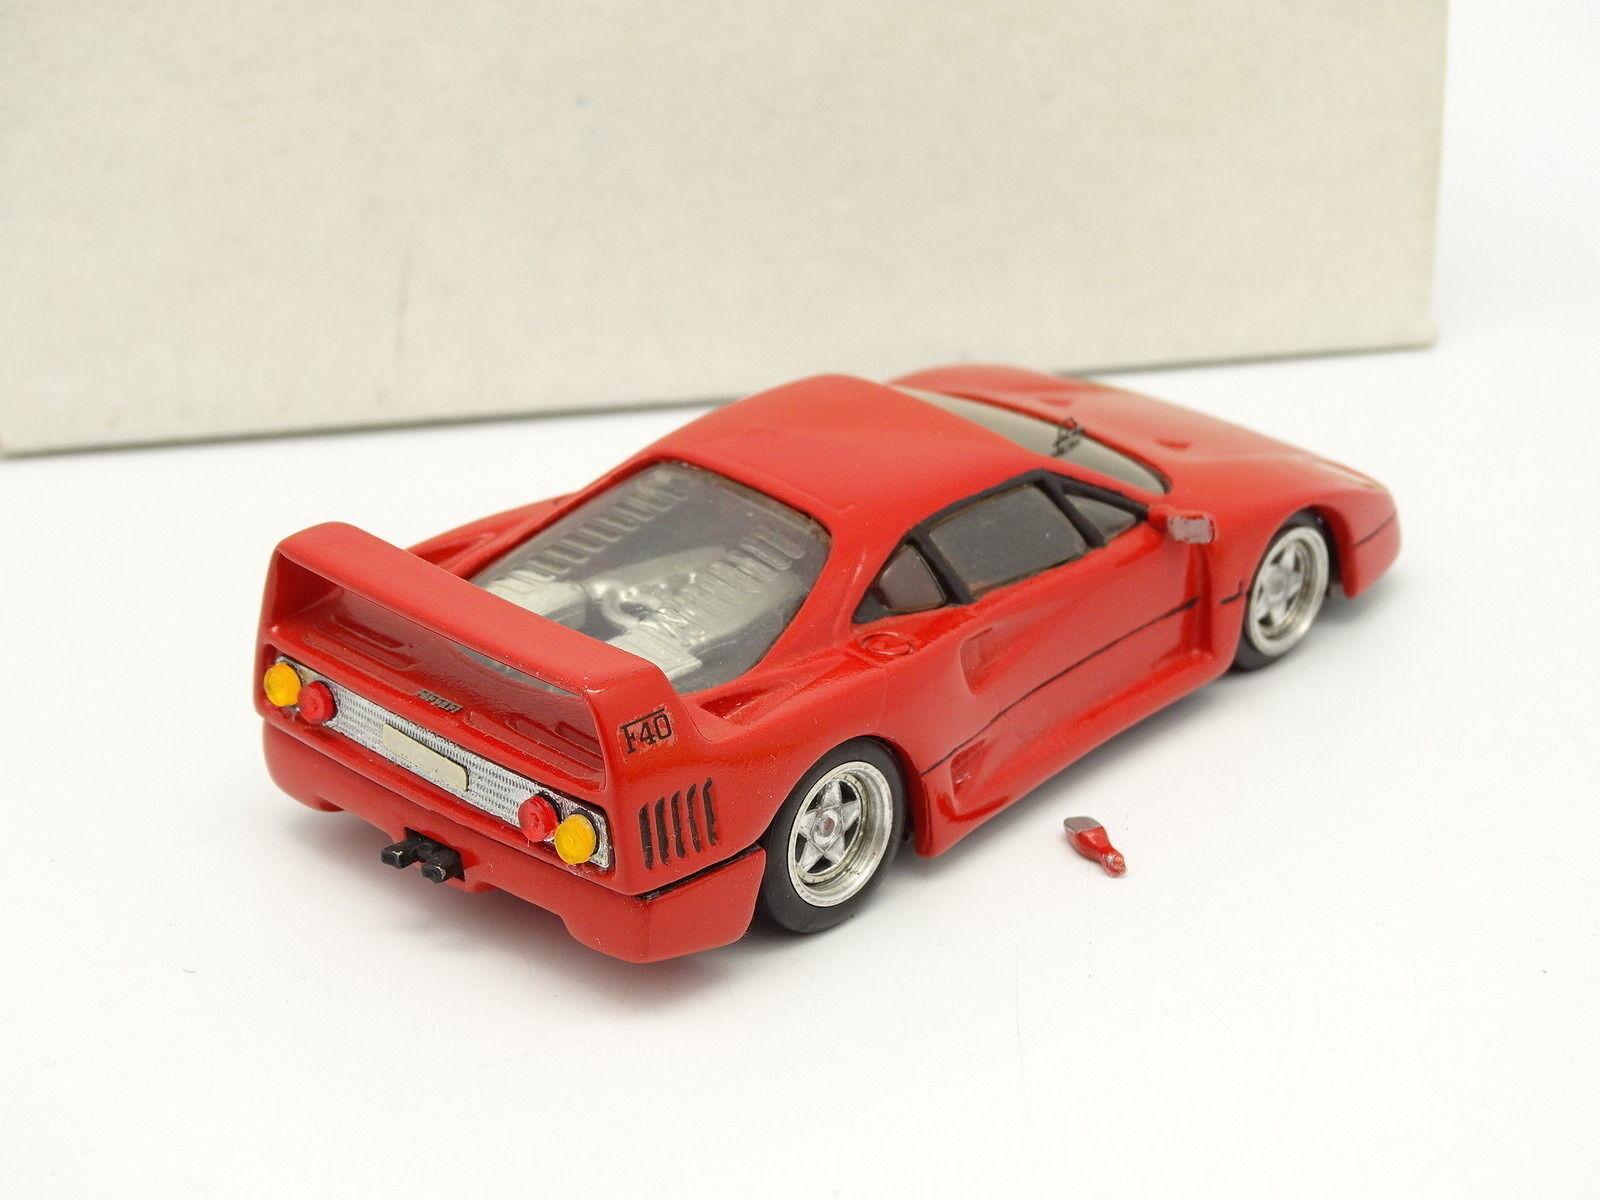 Kit Assembled Assembled Assembled 1 43 - Ferrari F40 Red bd6878